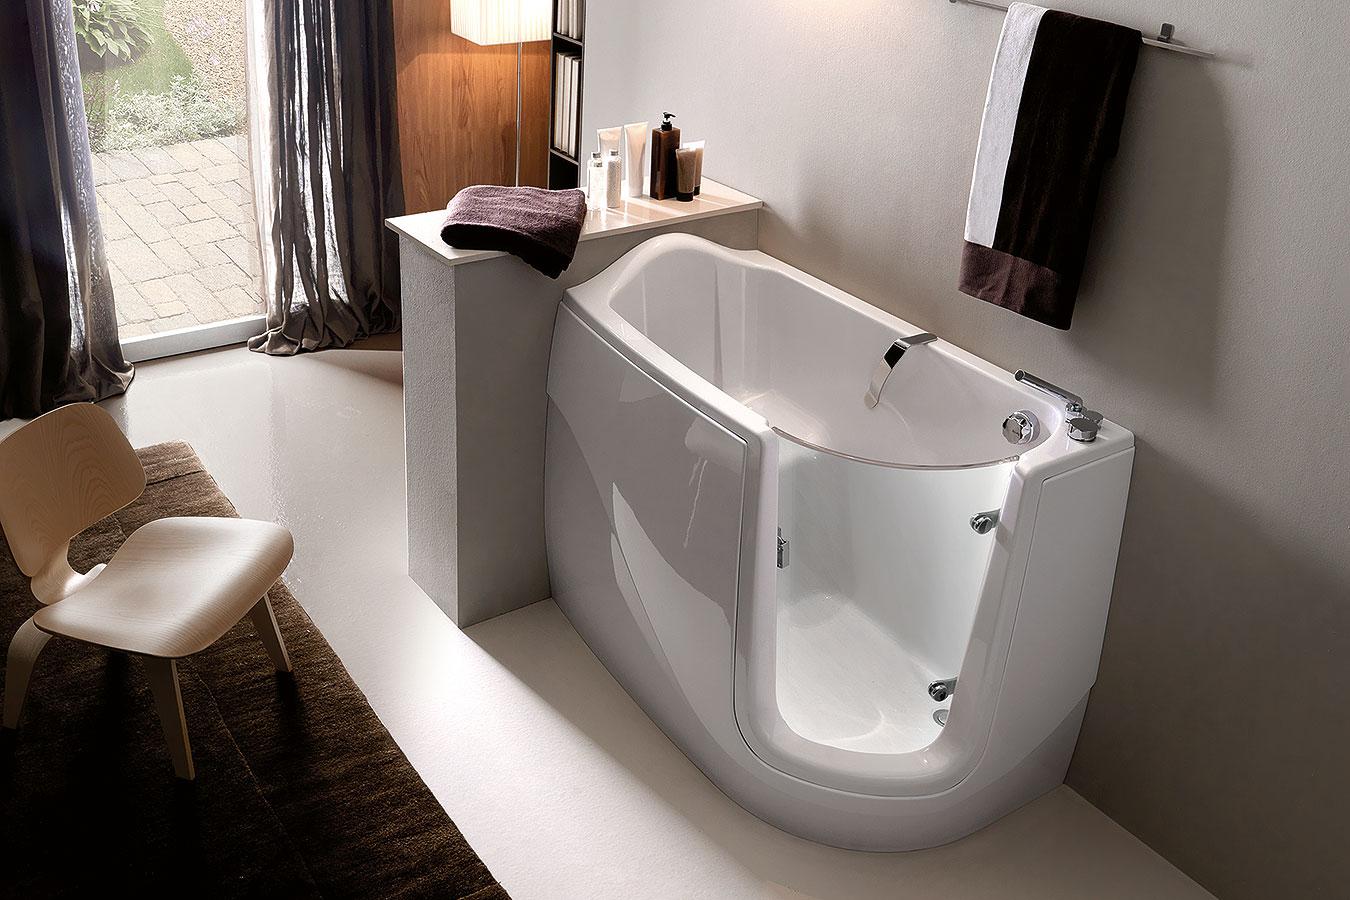 Vasca Da Bagno Vintage Misure : Treesse vasche vasche da bagno edilceramiche di maccanò